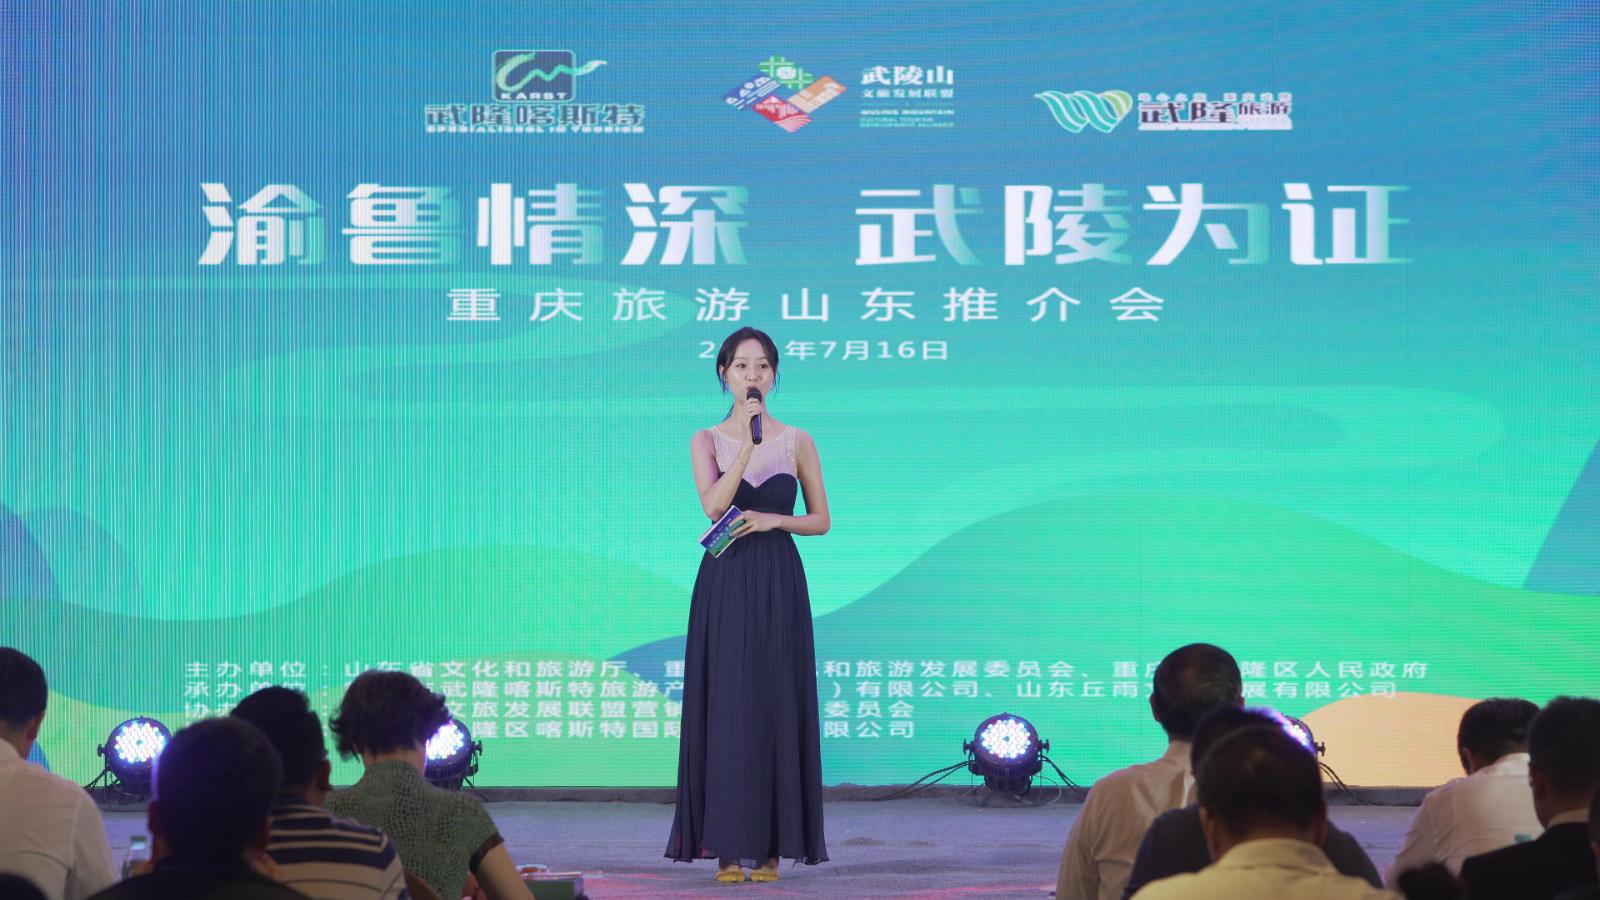 http://img.toumeiw.cn/upload/images/20210719/8d089b0b11aff00412812fed1e7846fb.jpg